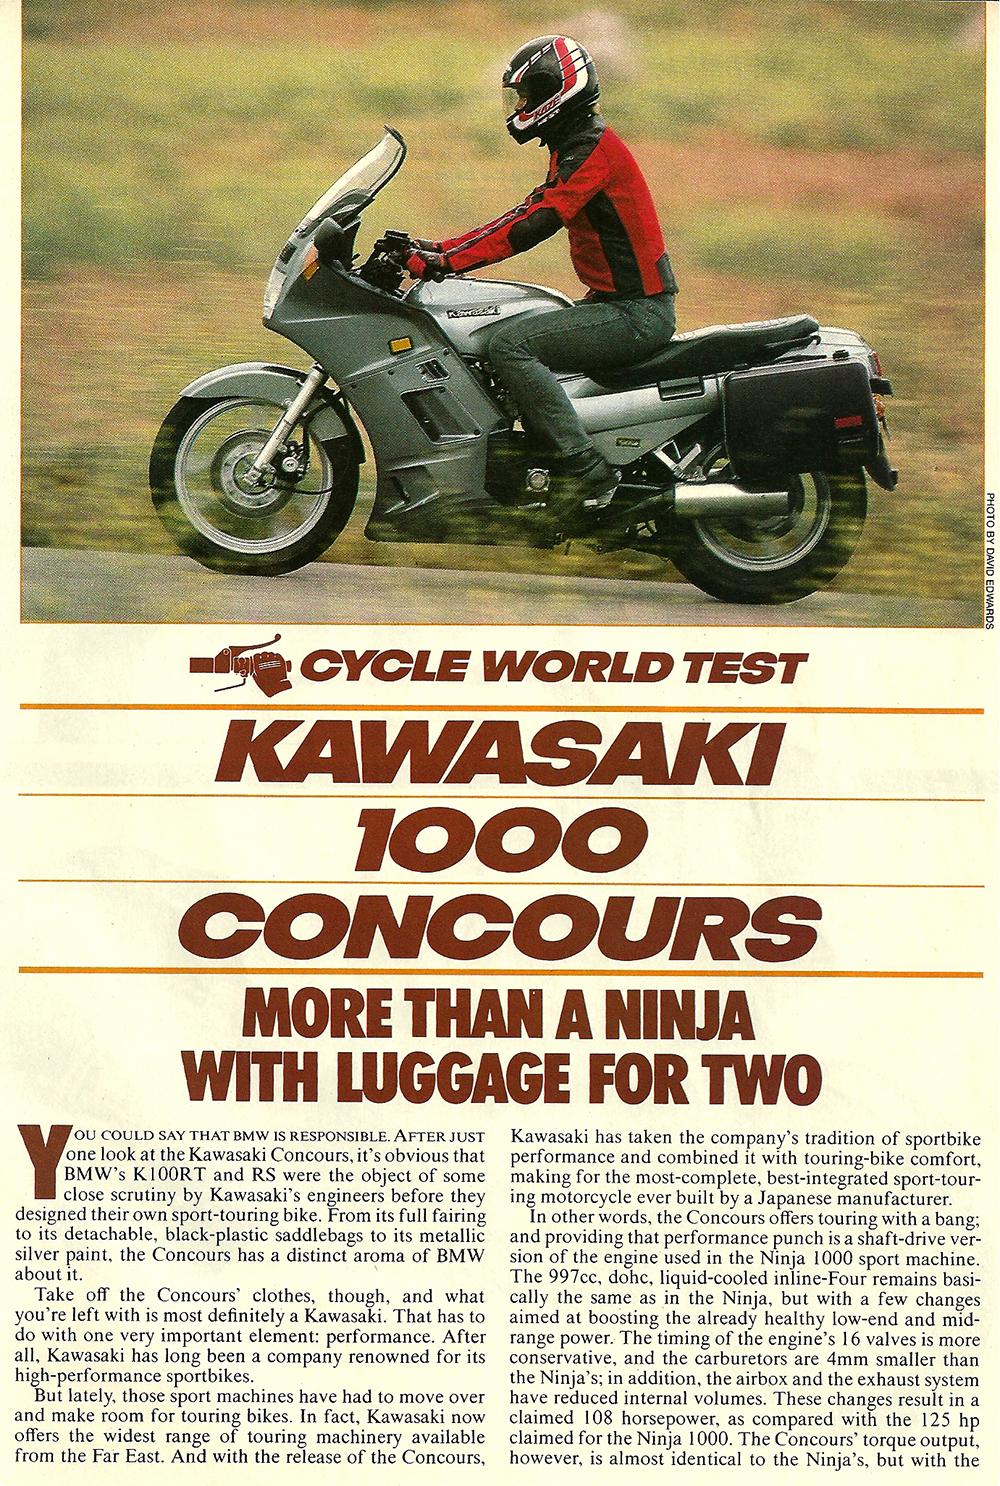 1986 Kawasaki 1000 Concours road test 02.jpg